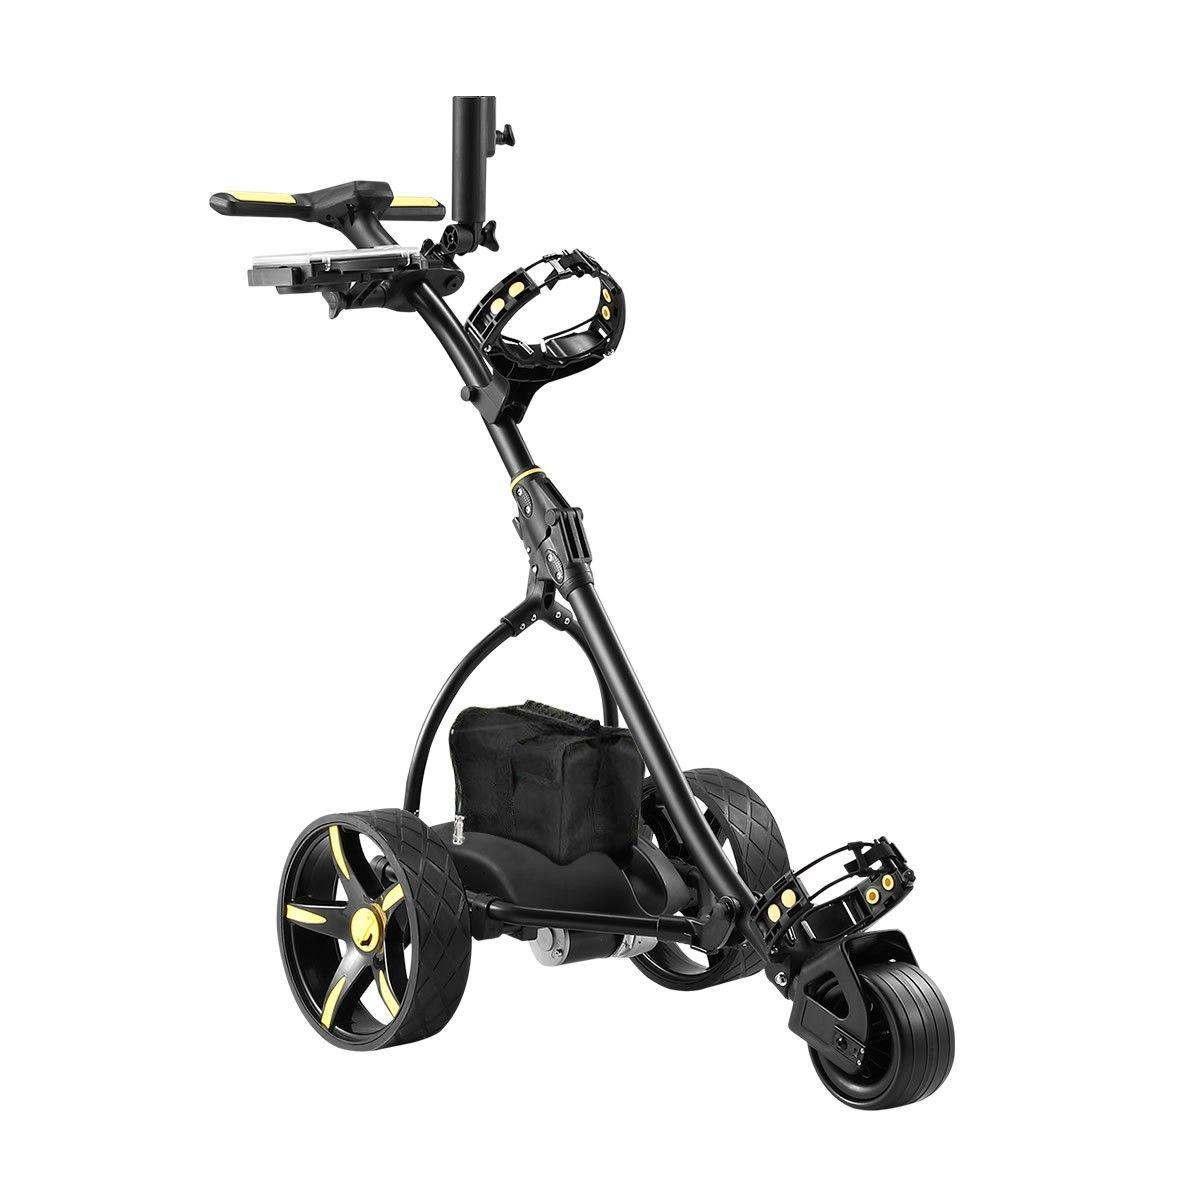 Electric Golf Trolley 3 Wheel Foldable Push Golf Buggy Cart 3 Distance Control LED Display Black